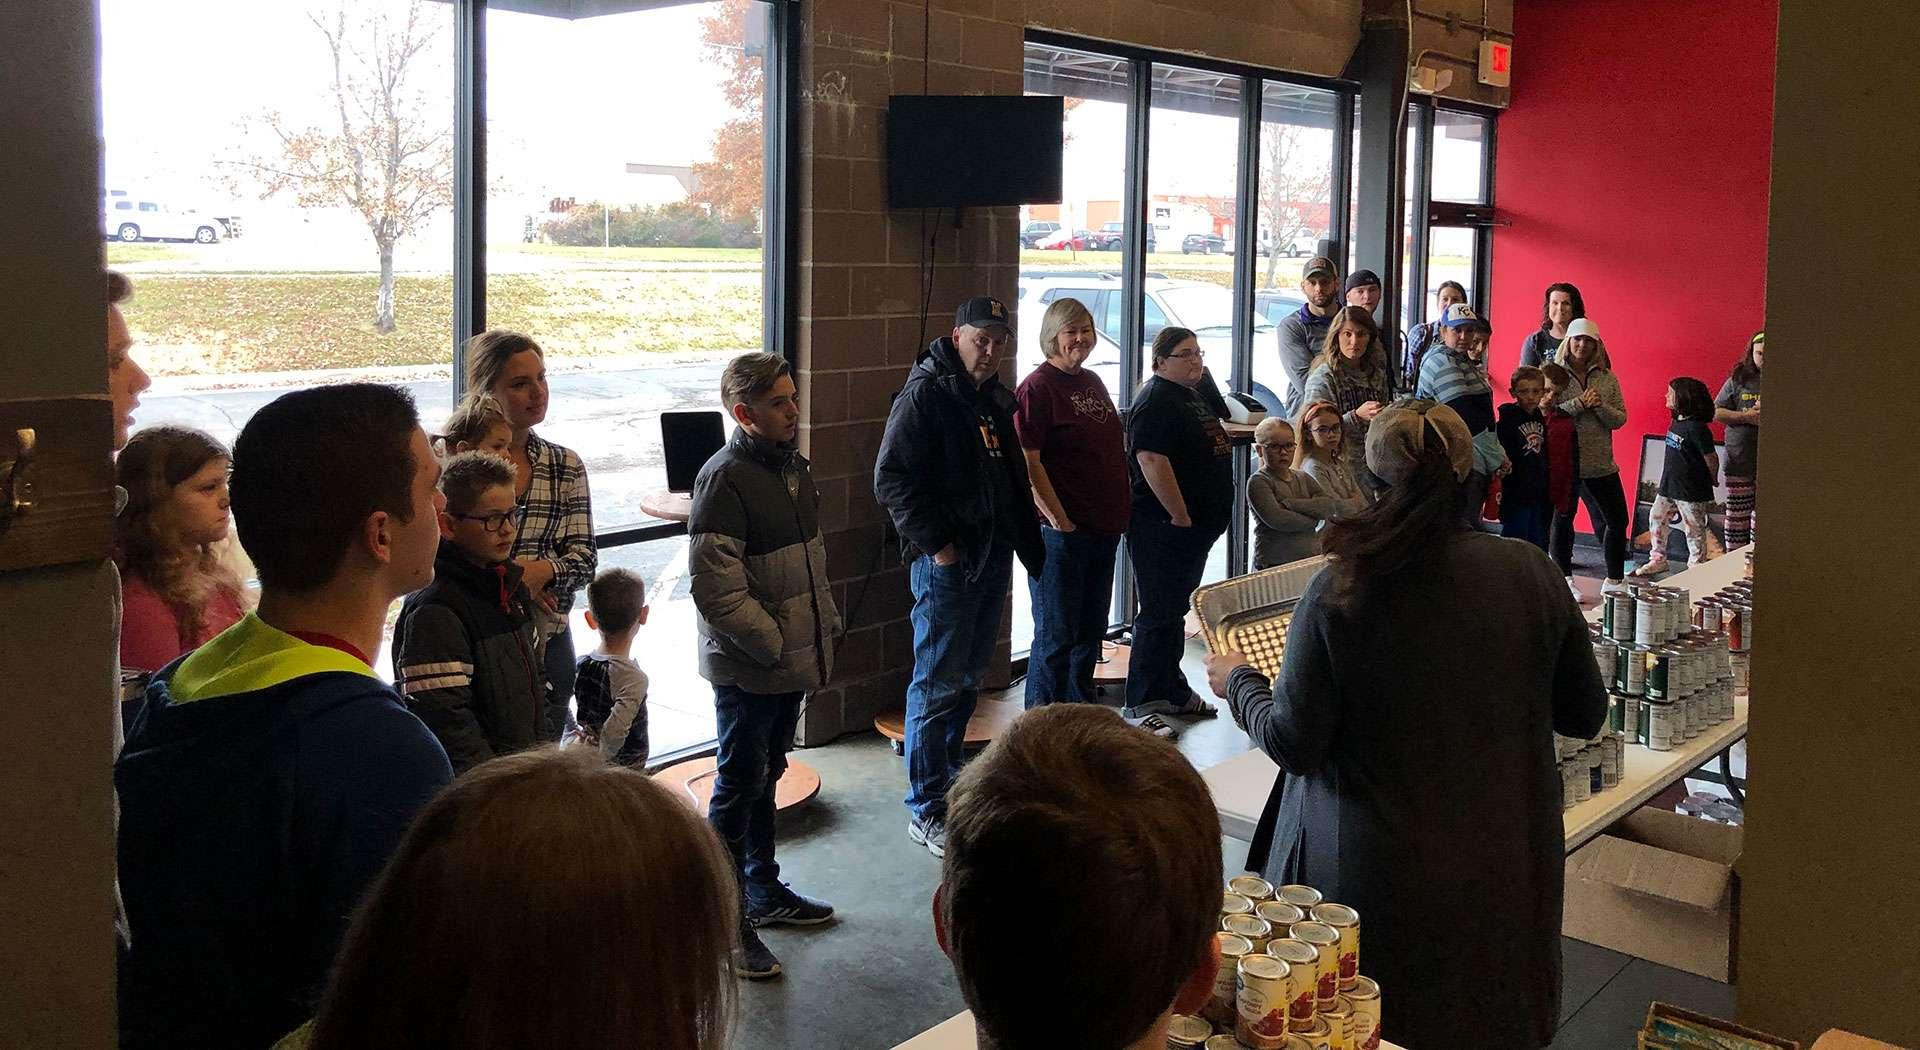 Thanksgiving Basket Outreach 2019 - Journey Church in Liberty, Missouri